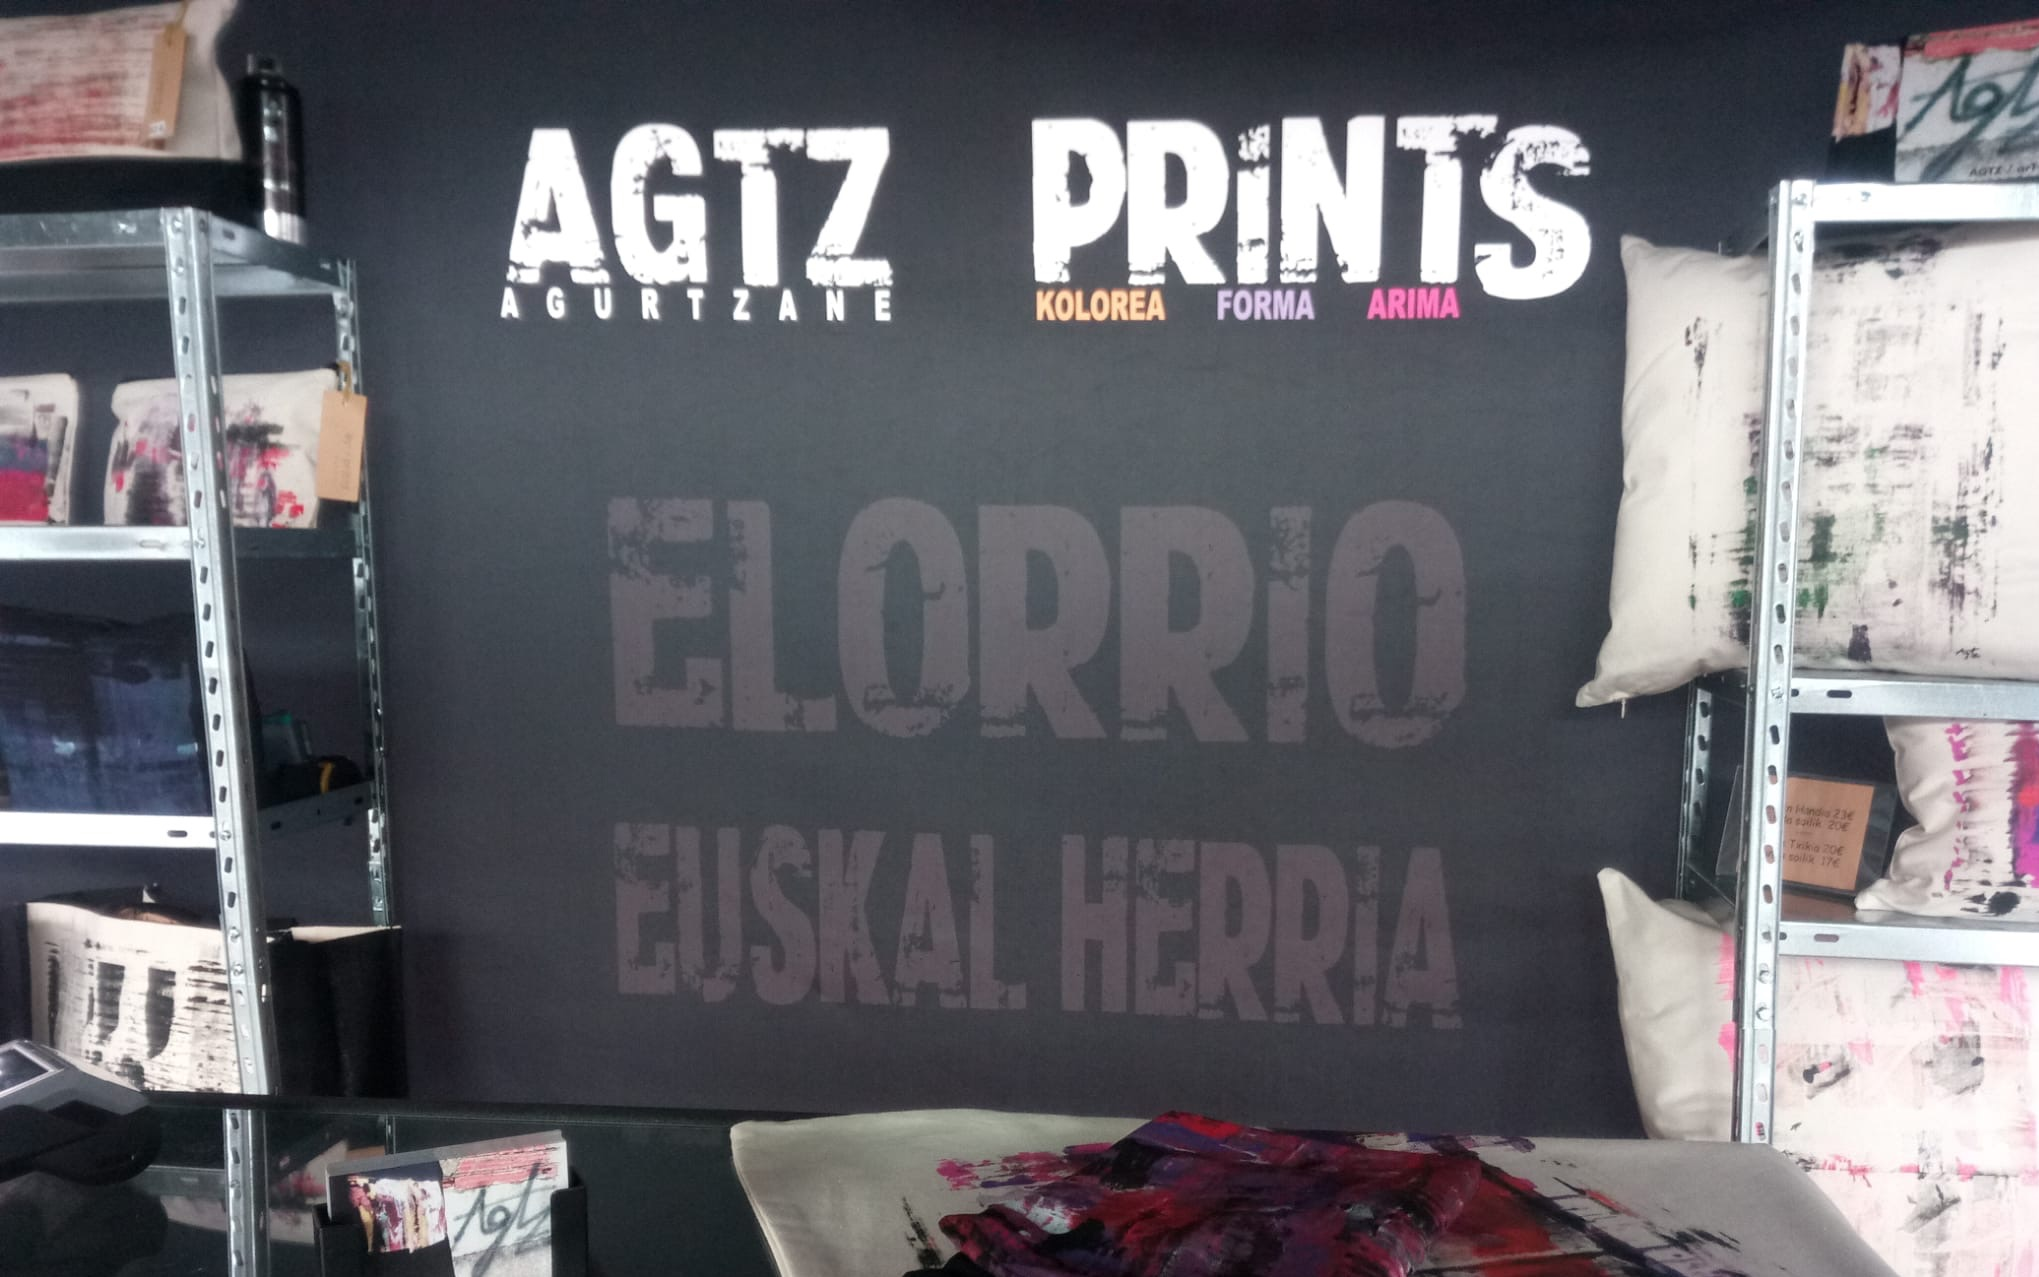 Agtz Prints brand